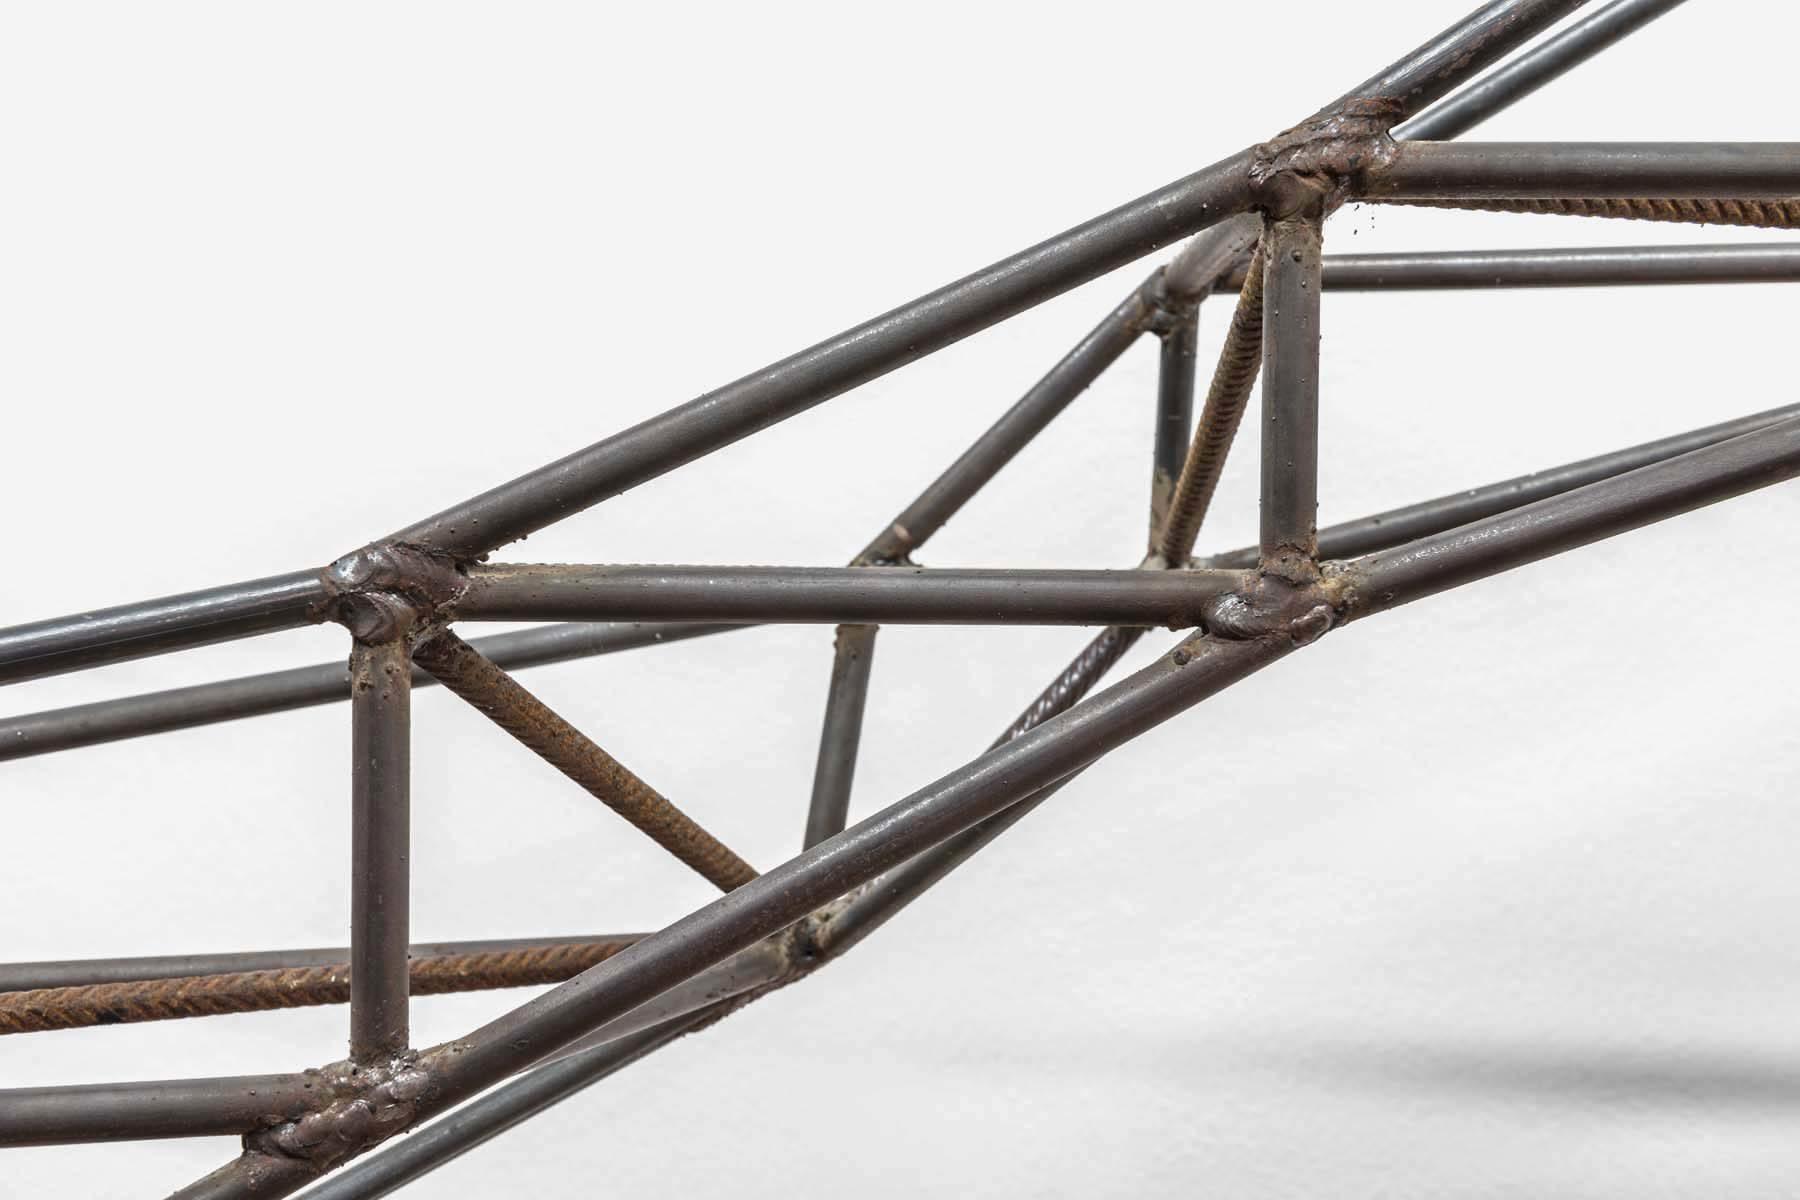 F. Prevedello, Schneller, weiter, höher aber wohin (109), particolare, 2014, iron, marble, welding, cm 314 x 325 x 102, courtesy of the artist and Cardelli & Fontana, ph. A. Ruzzier